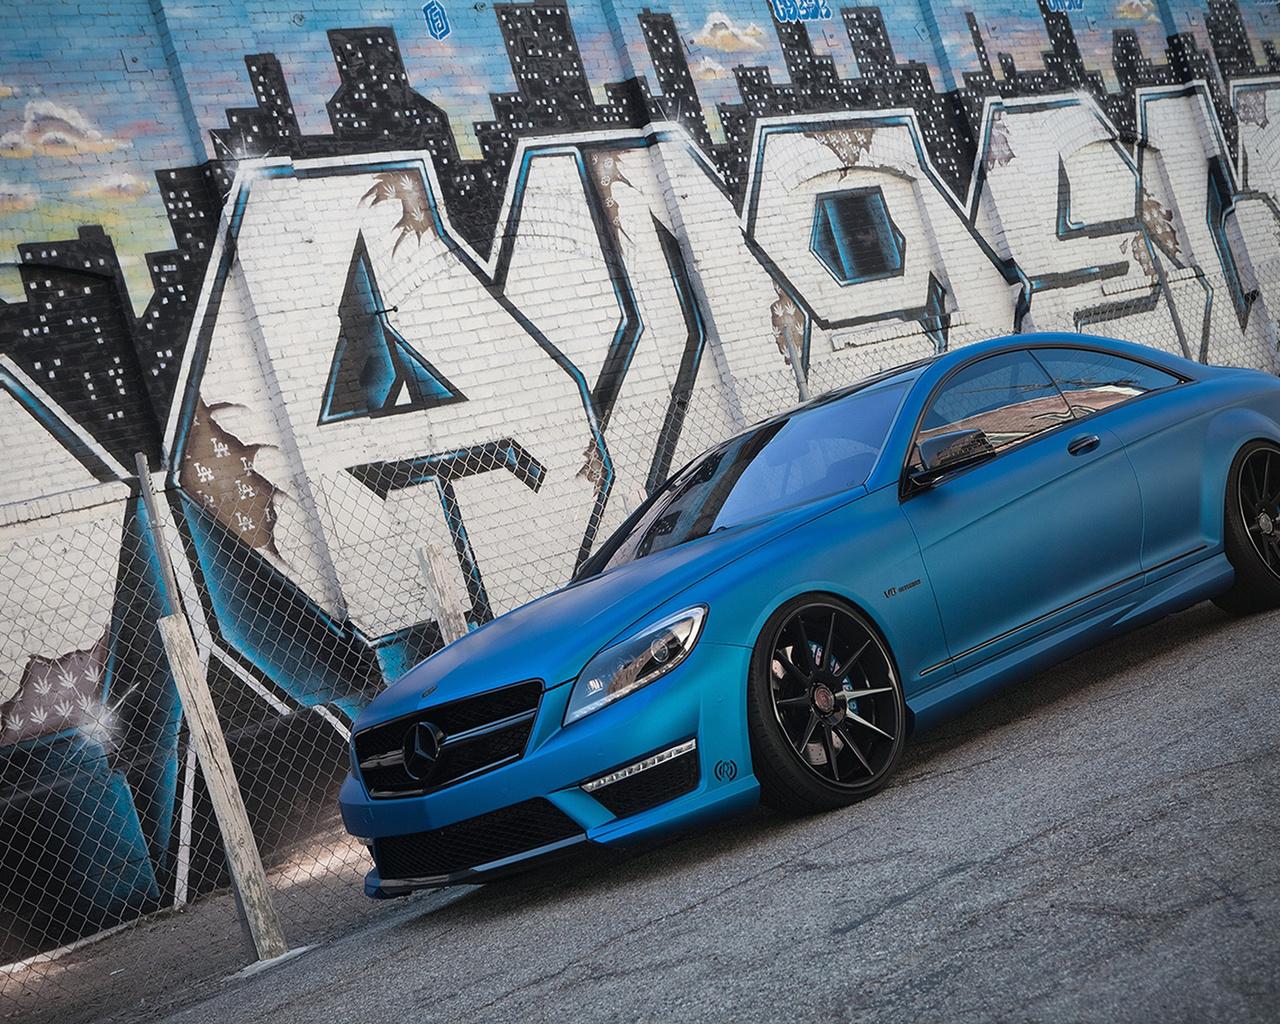 Картинки vossen, m5, обоя, wallpapers, auto, bmw, e39, car, black, bummer, автомобиль, tuning - обои 1440x900